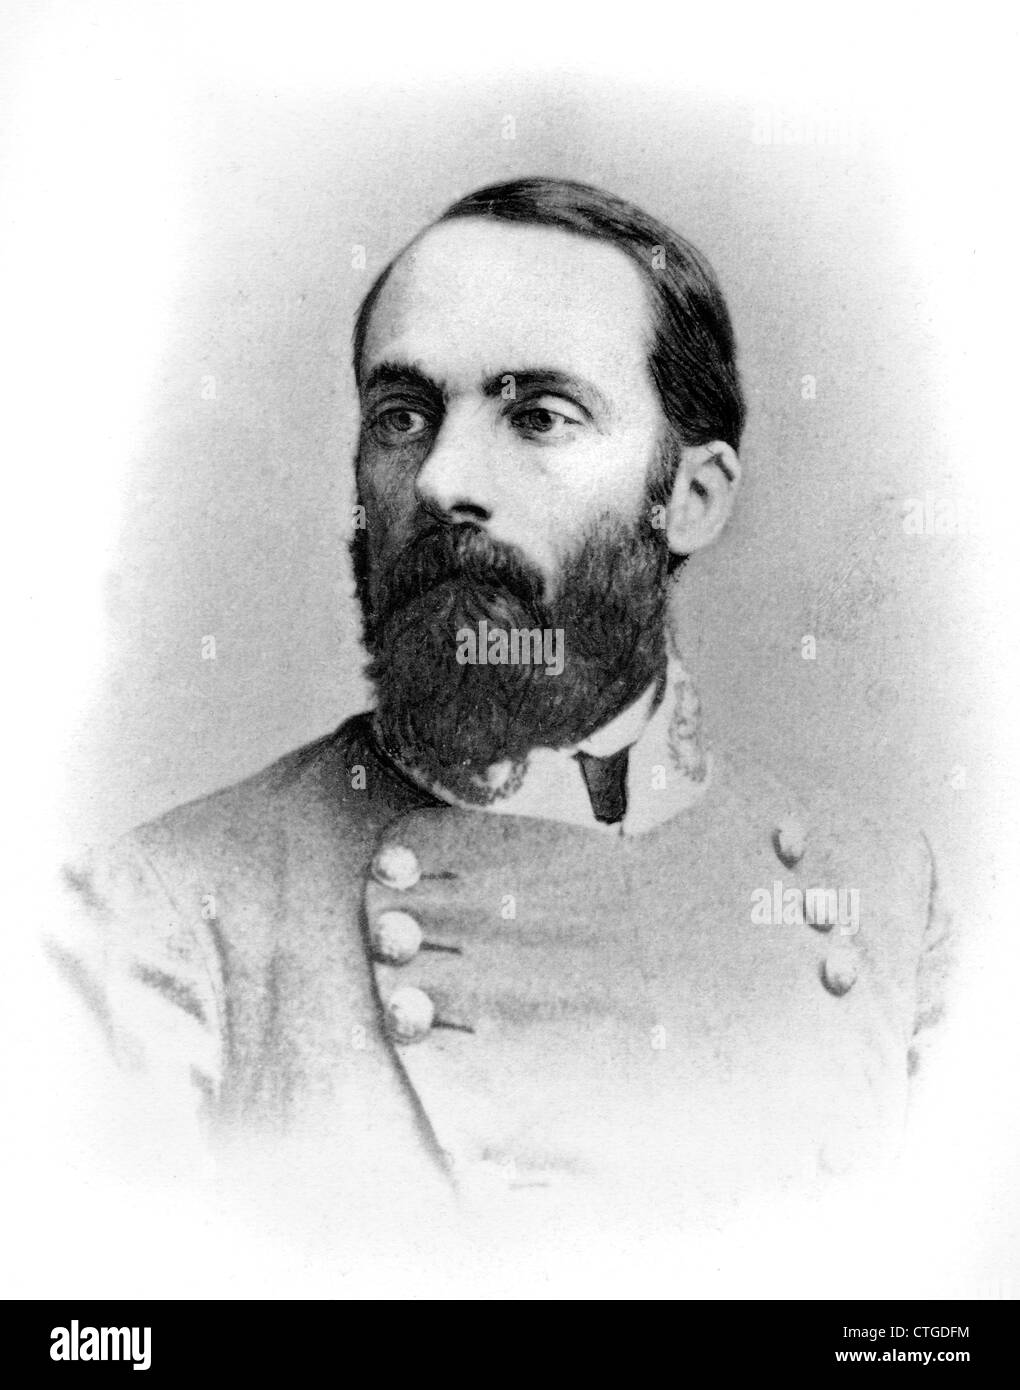 1800s 1860s CONFEDERATE GENERAL JOSEPH WHEELER DURING AMERICAN CIVIL WAR - Stock Image